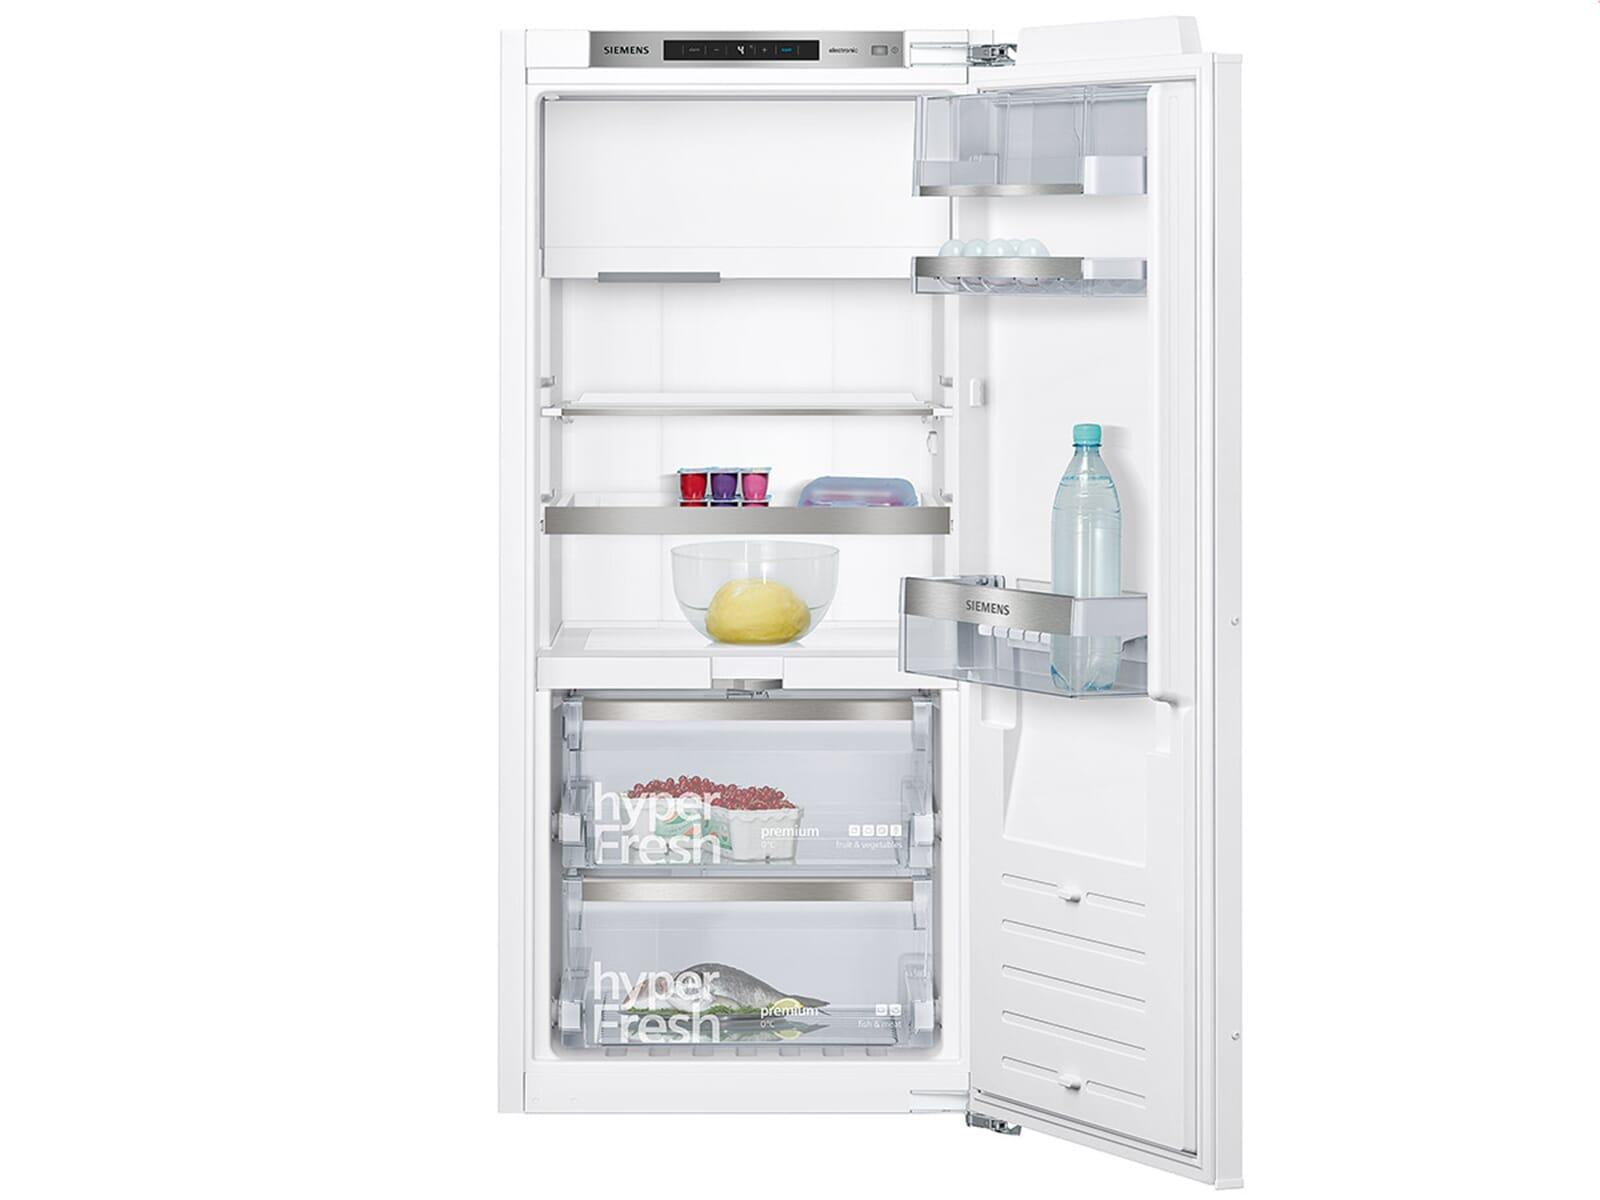 Siemens Kühlschrank Einbau : Siemens ki fad einbaukühlschrank